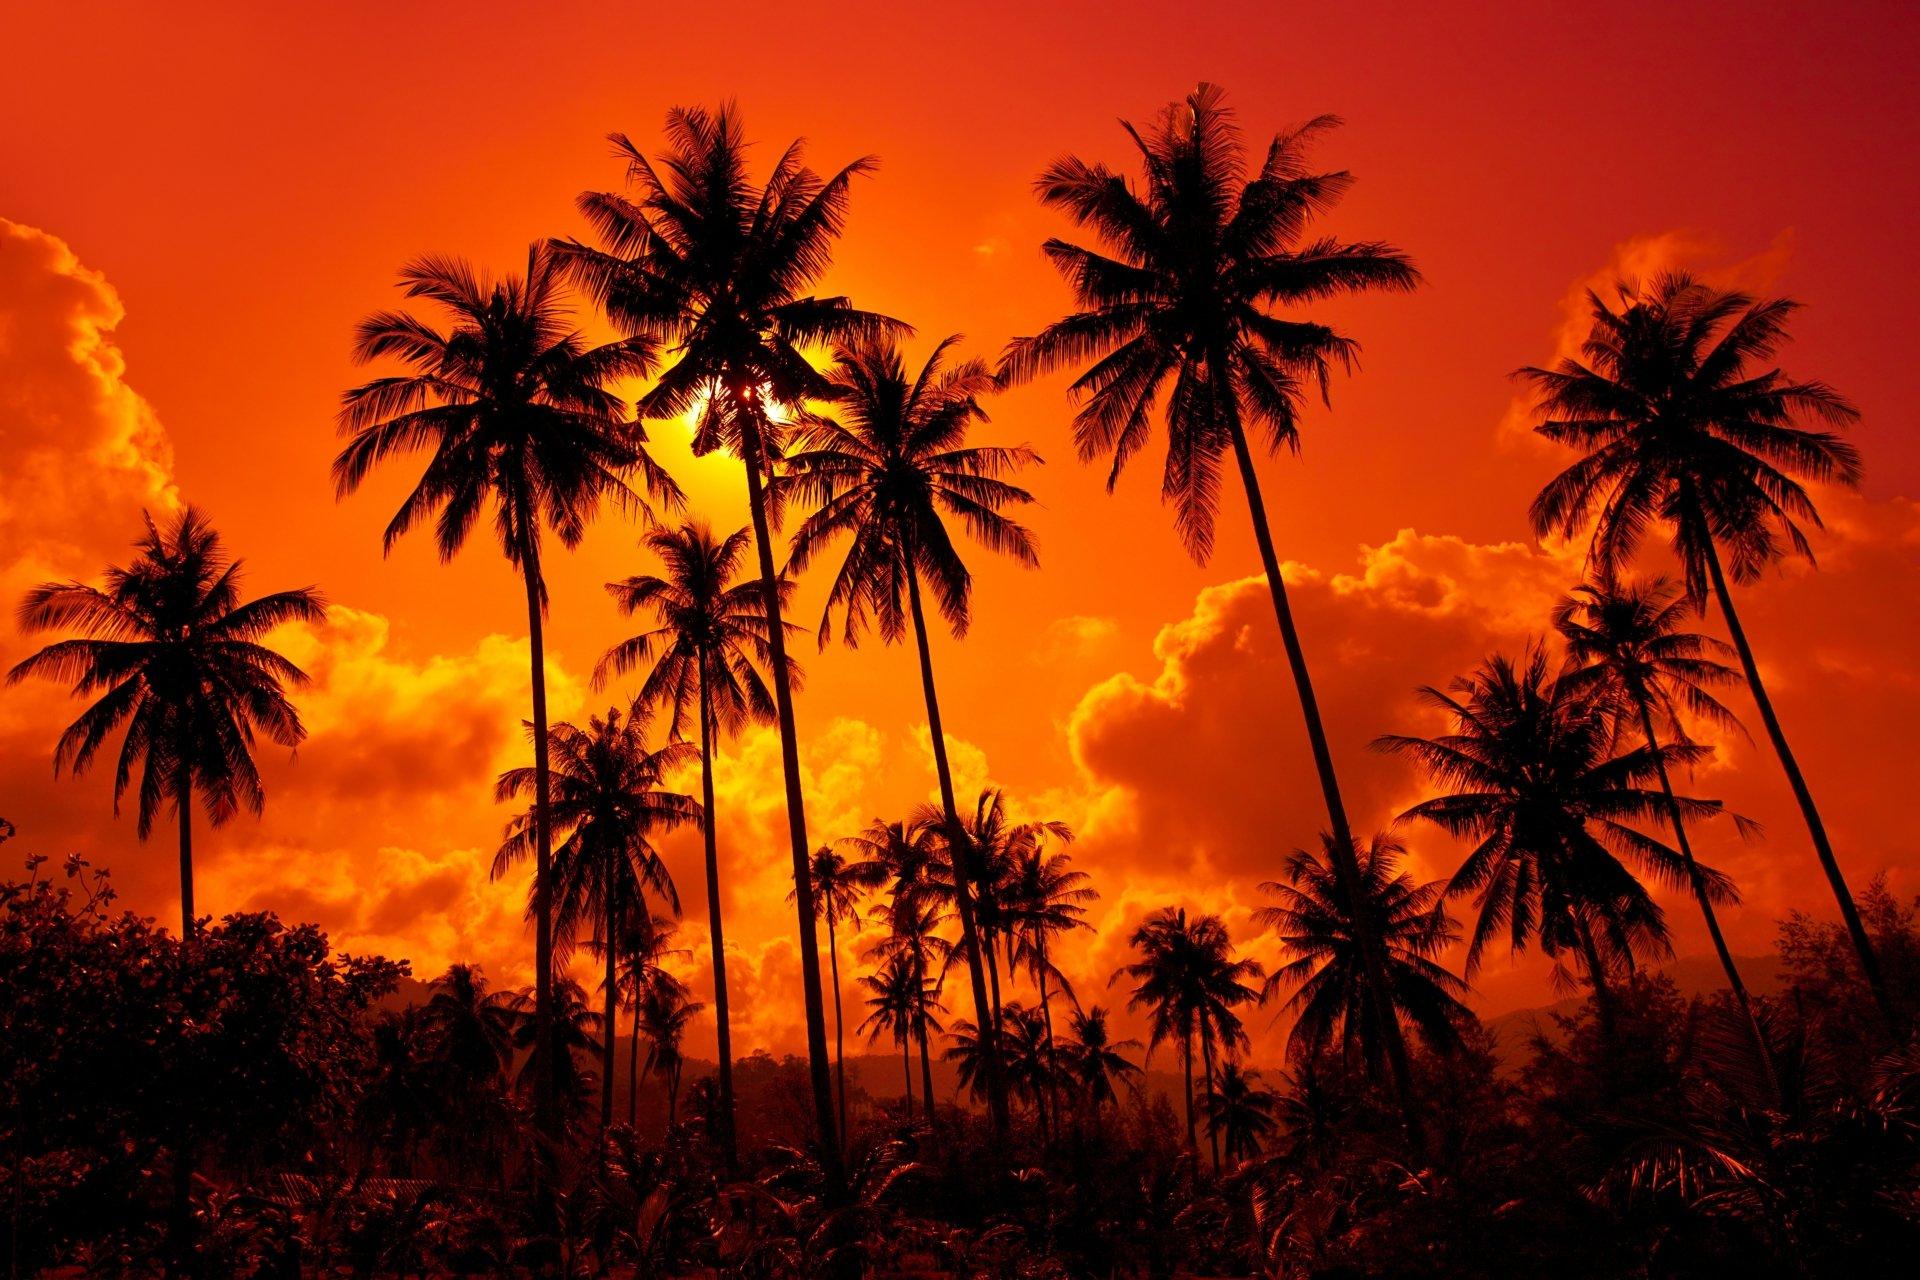 Sunset Over Beach Of Palm Trees Hd Wallpaper: Palmera 4k Ultra HD Fondo De Pantalla And Fondo De